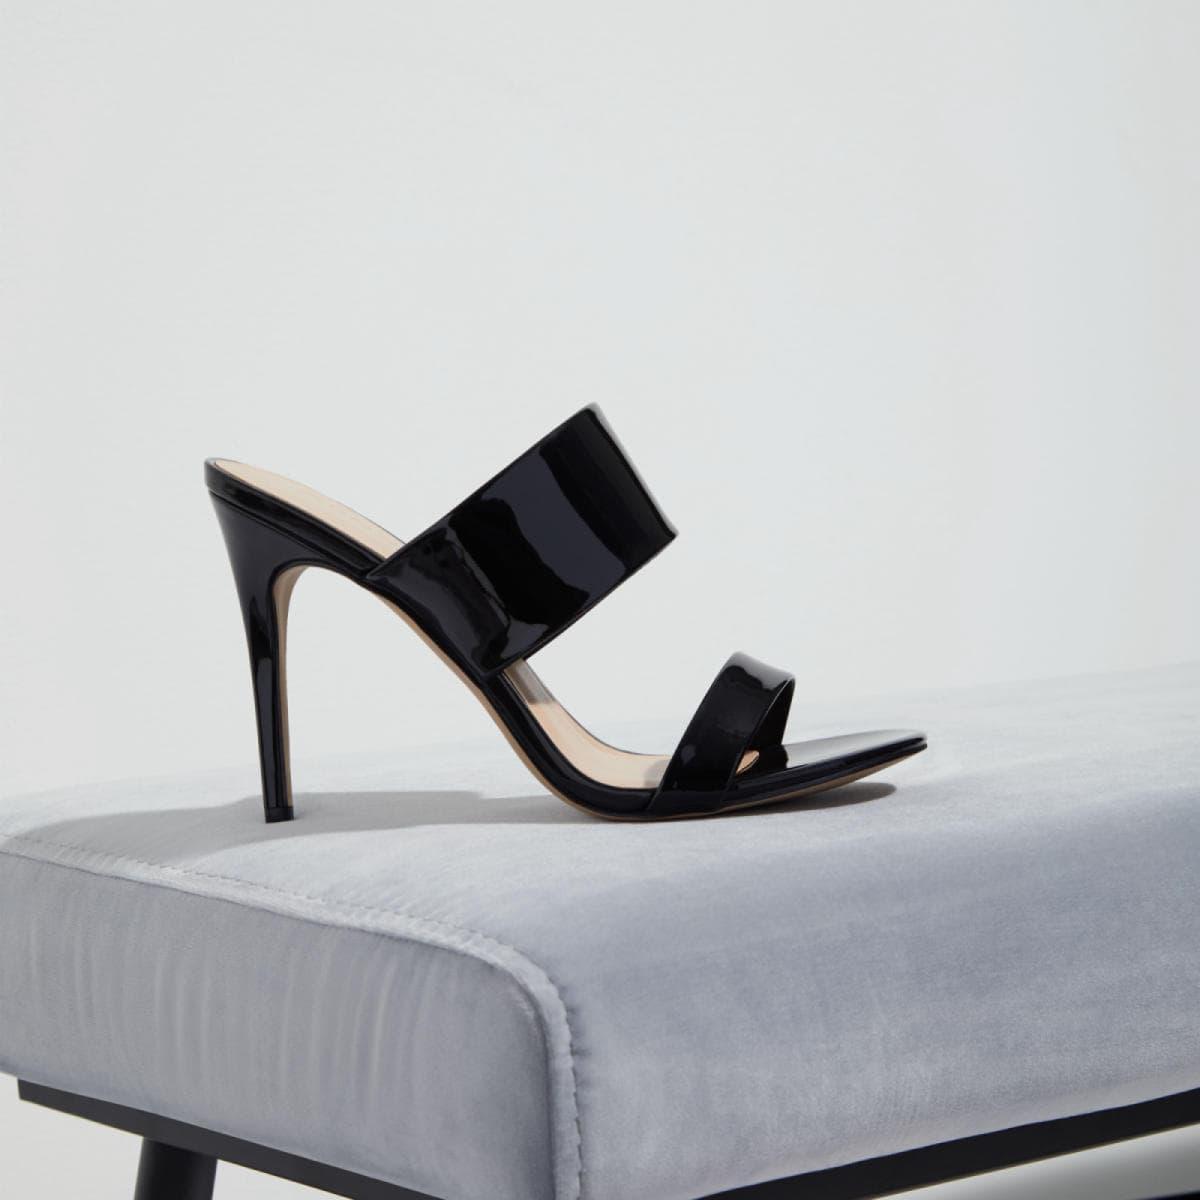 532f472ba55 Froema Black Patent Women s Mules